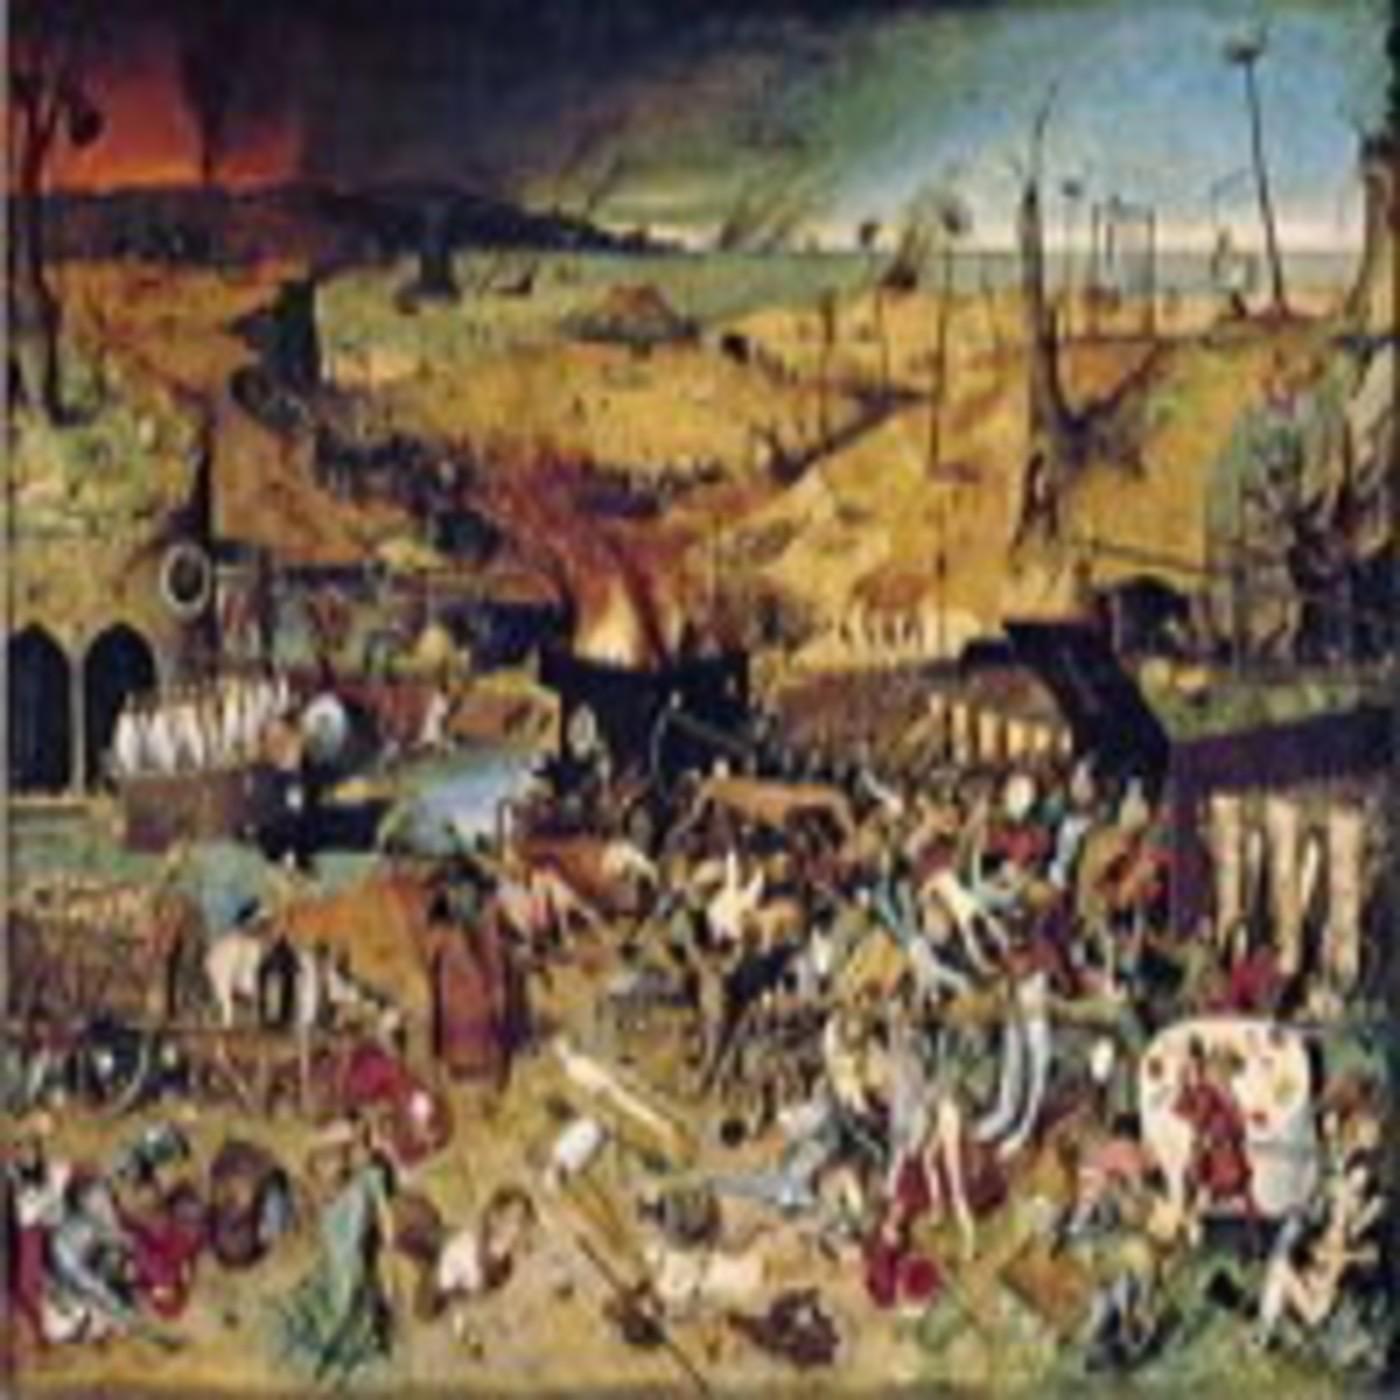 La peste negra, la epidemia más mortífera de la Edad Media